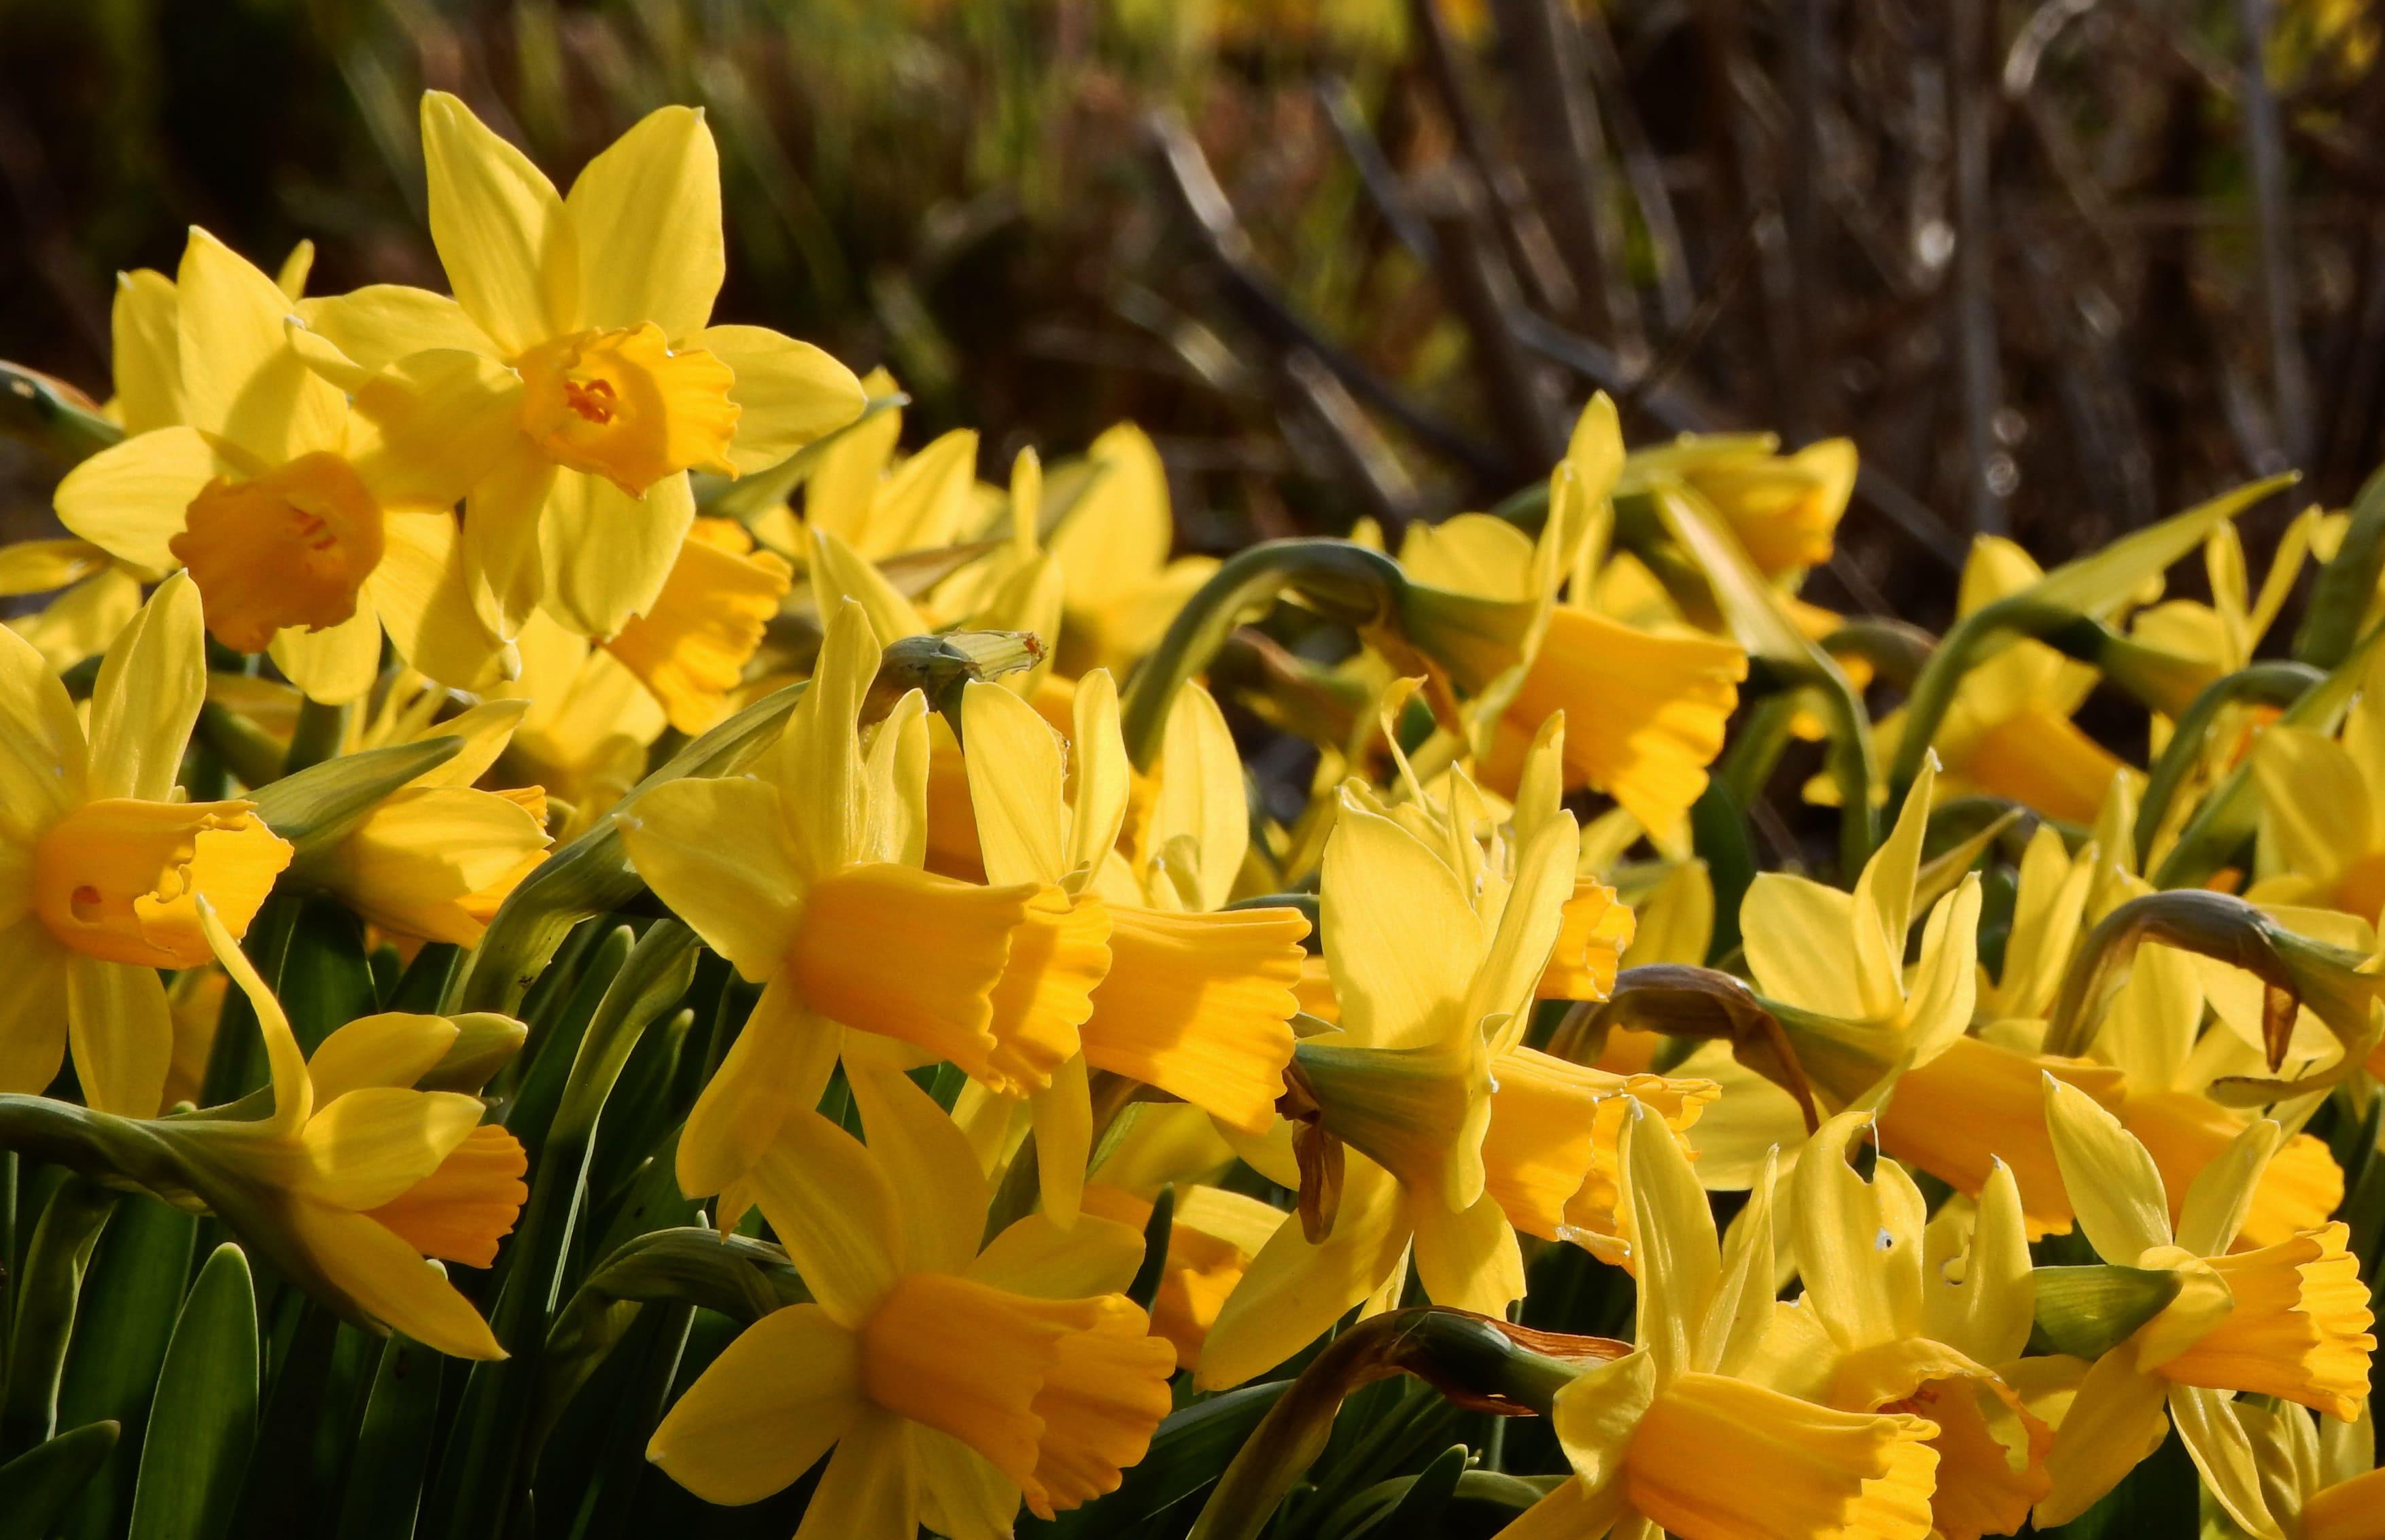 daffodils-photo-51